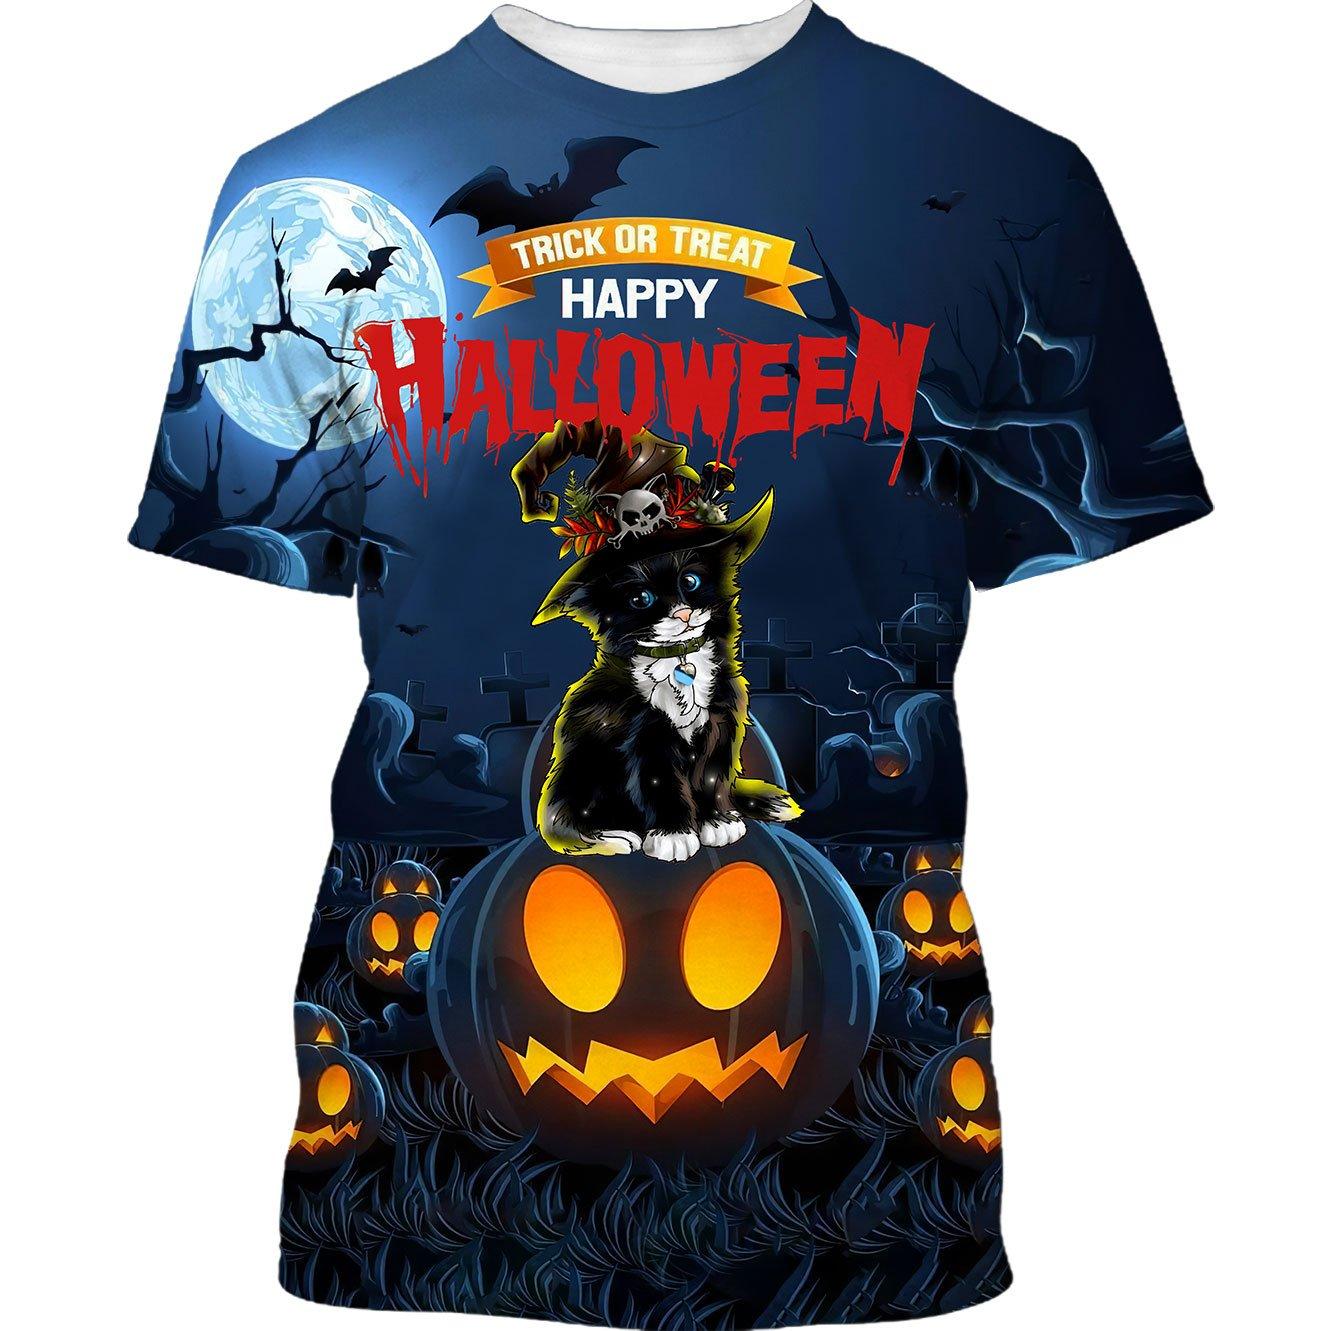 Black Cat Trick or Treat Halloween T shirt